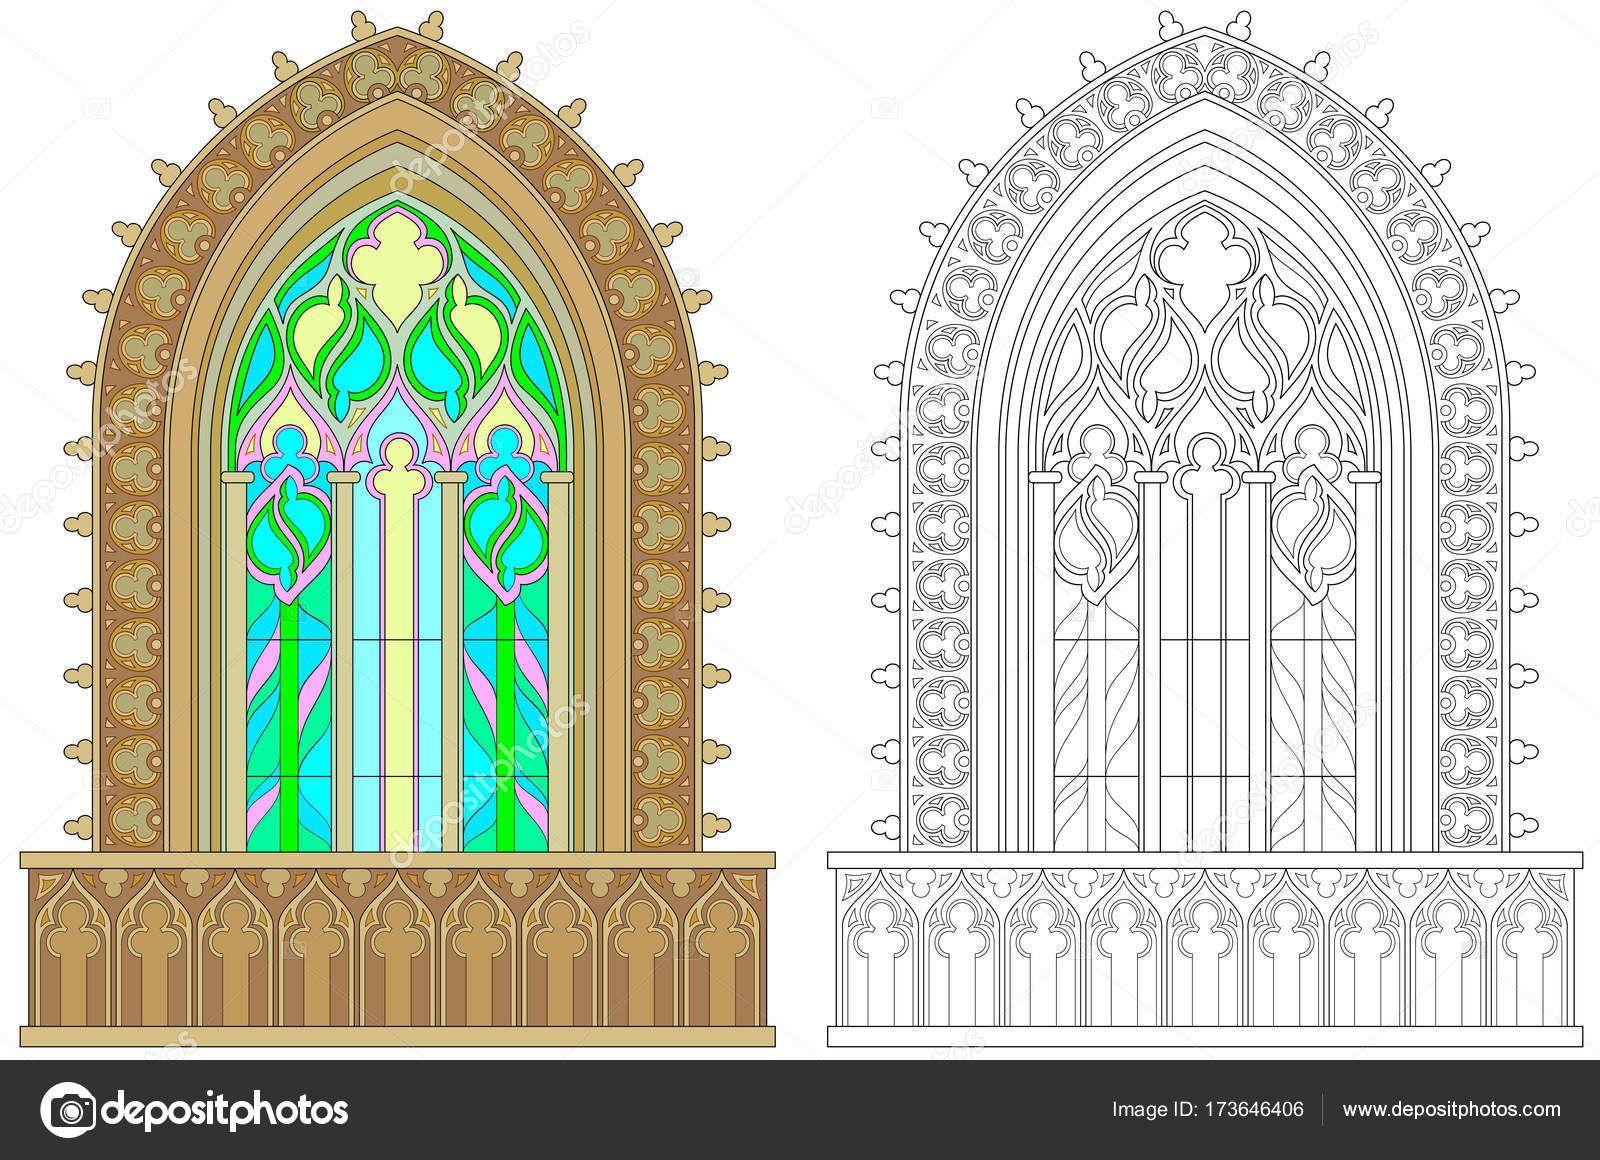 Renkli Ve Siyah Beyaz Desen Boyama Fantezi Gotik Vitray Pencere